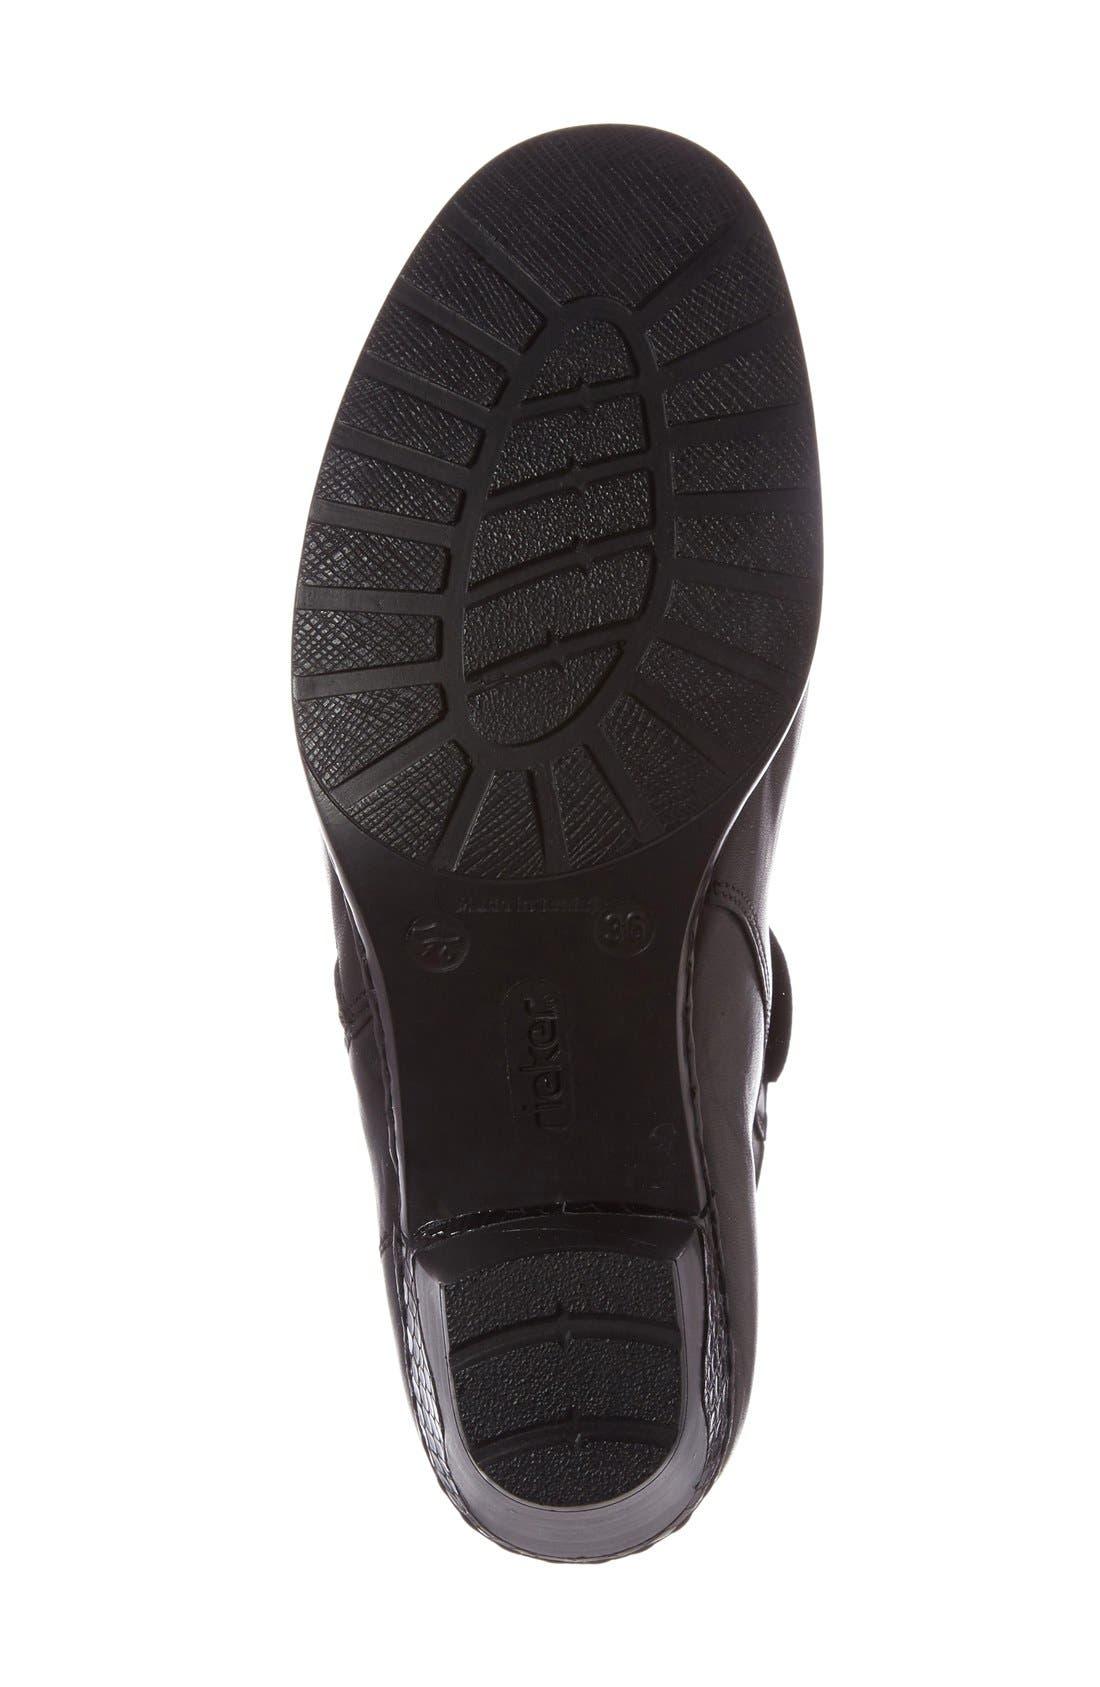 Lynn 61 Bootie,                             Alternate thumbnail 4, color,                             Black/ Black Leather